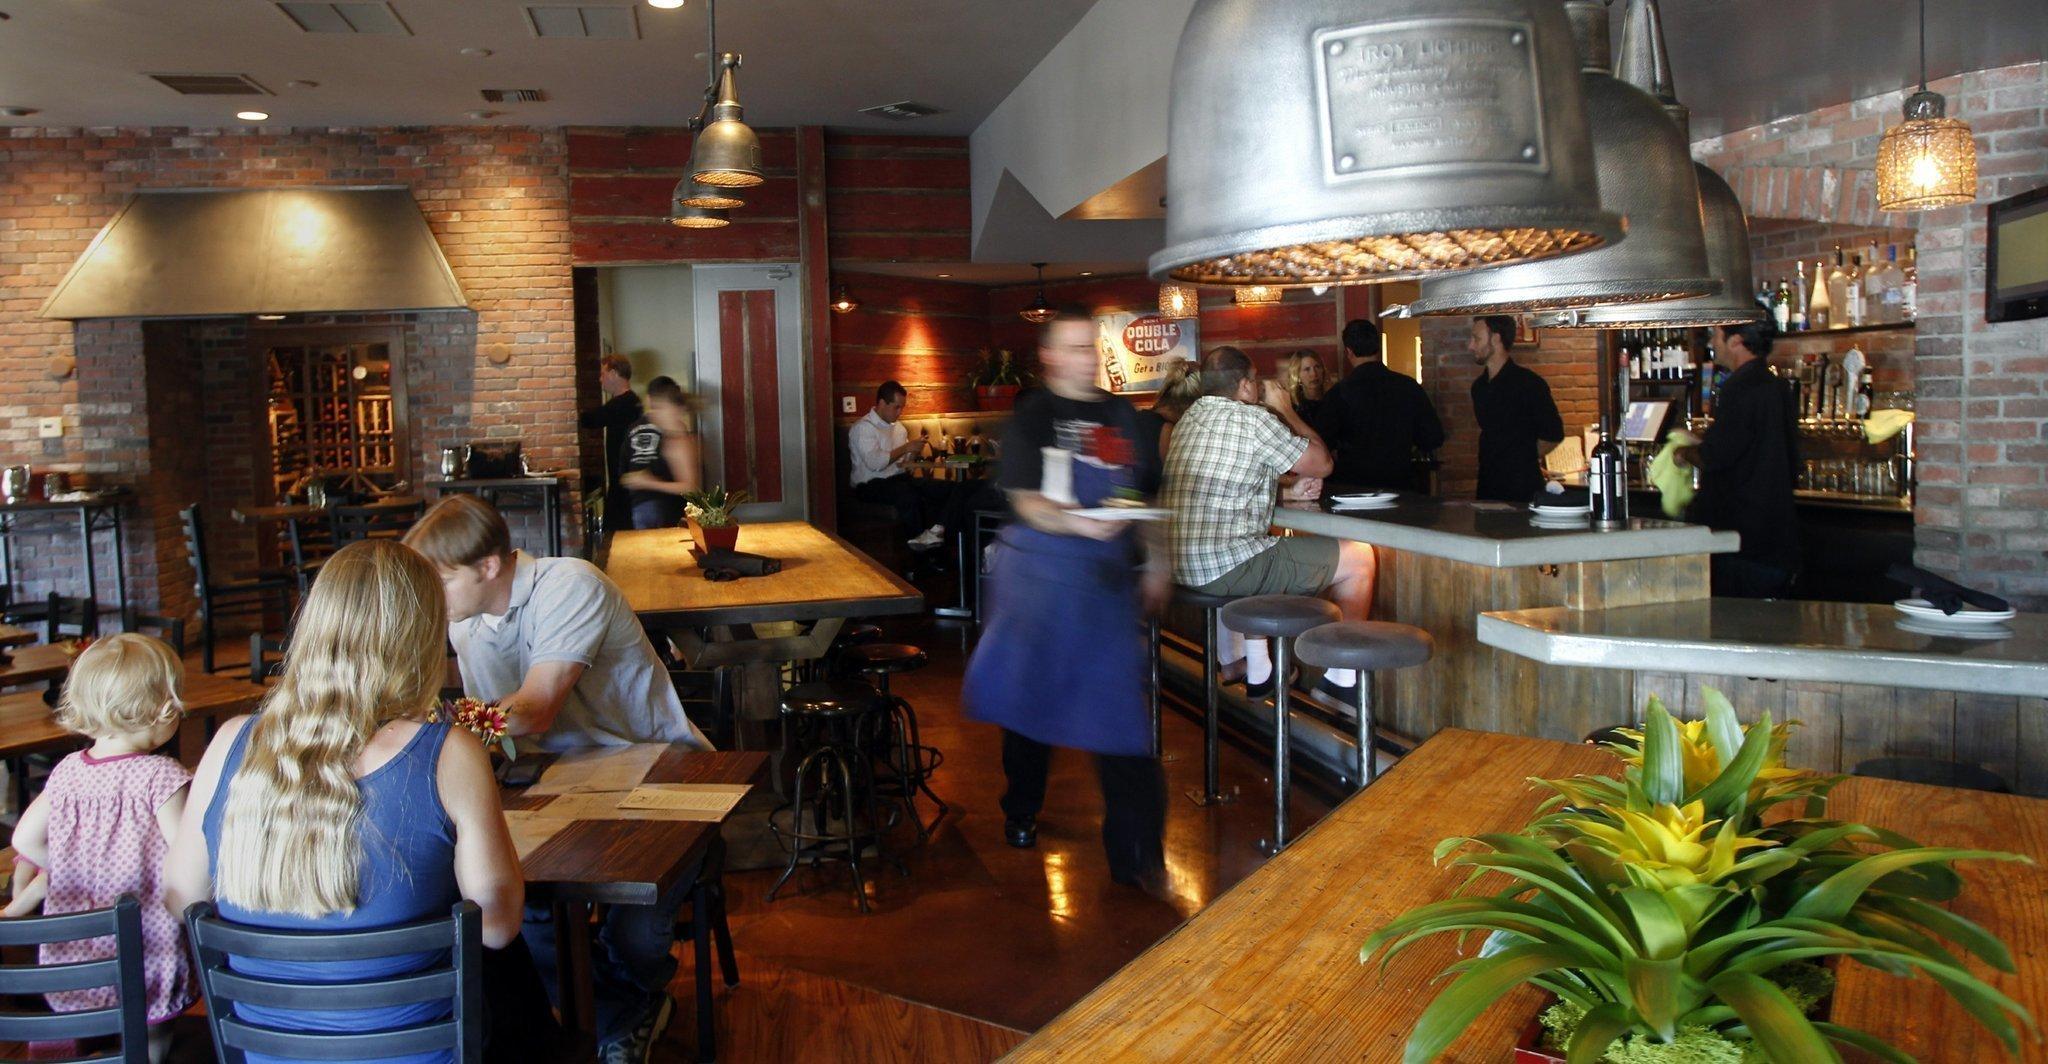 Our picks for San Diego Restaurant Week - The San Diego Union-Tribune